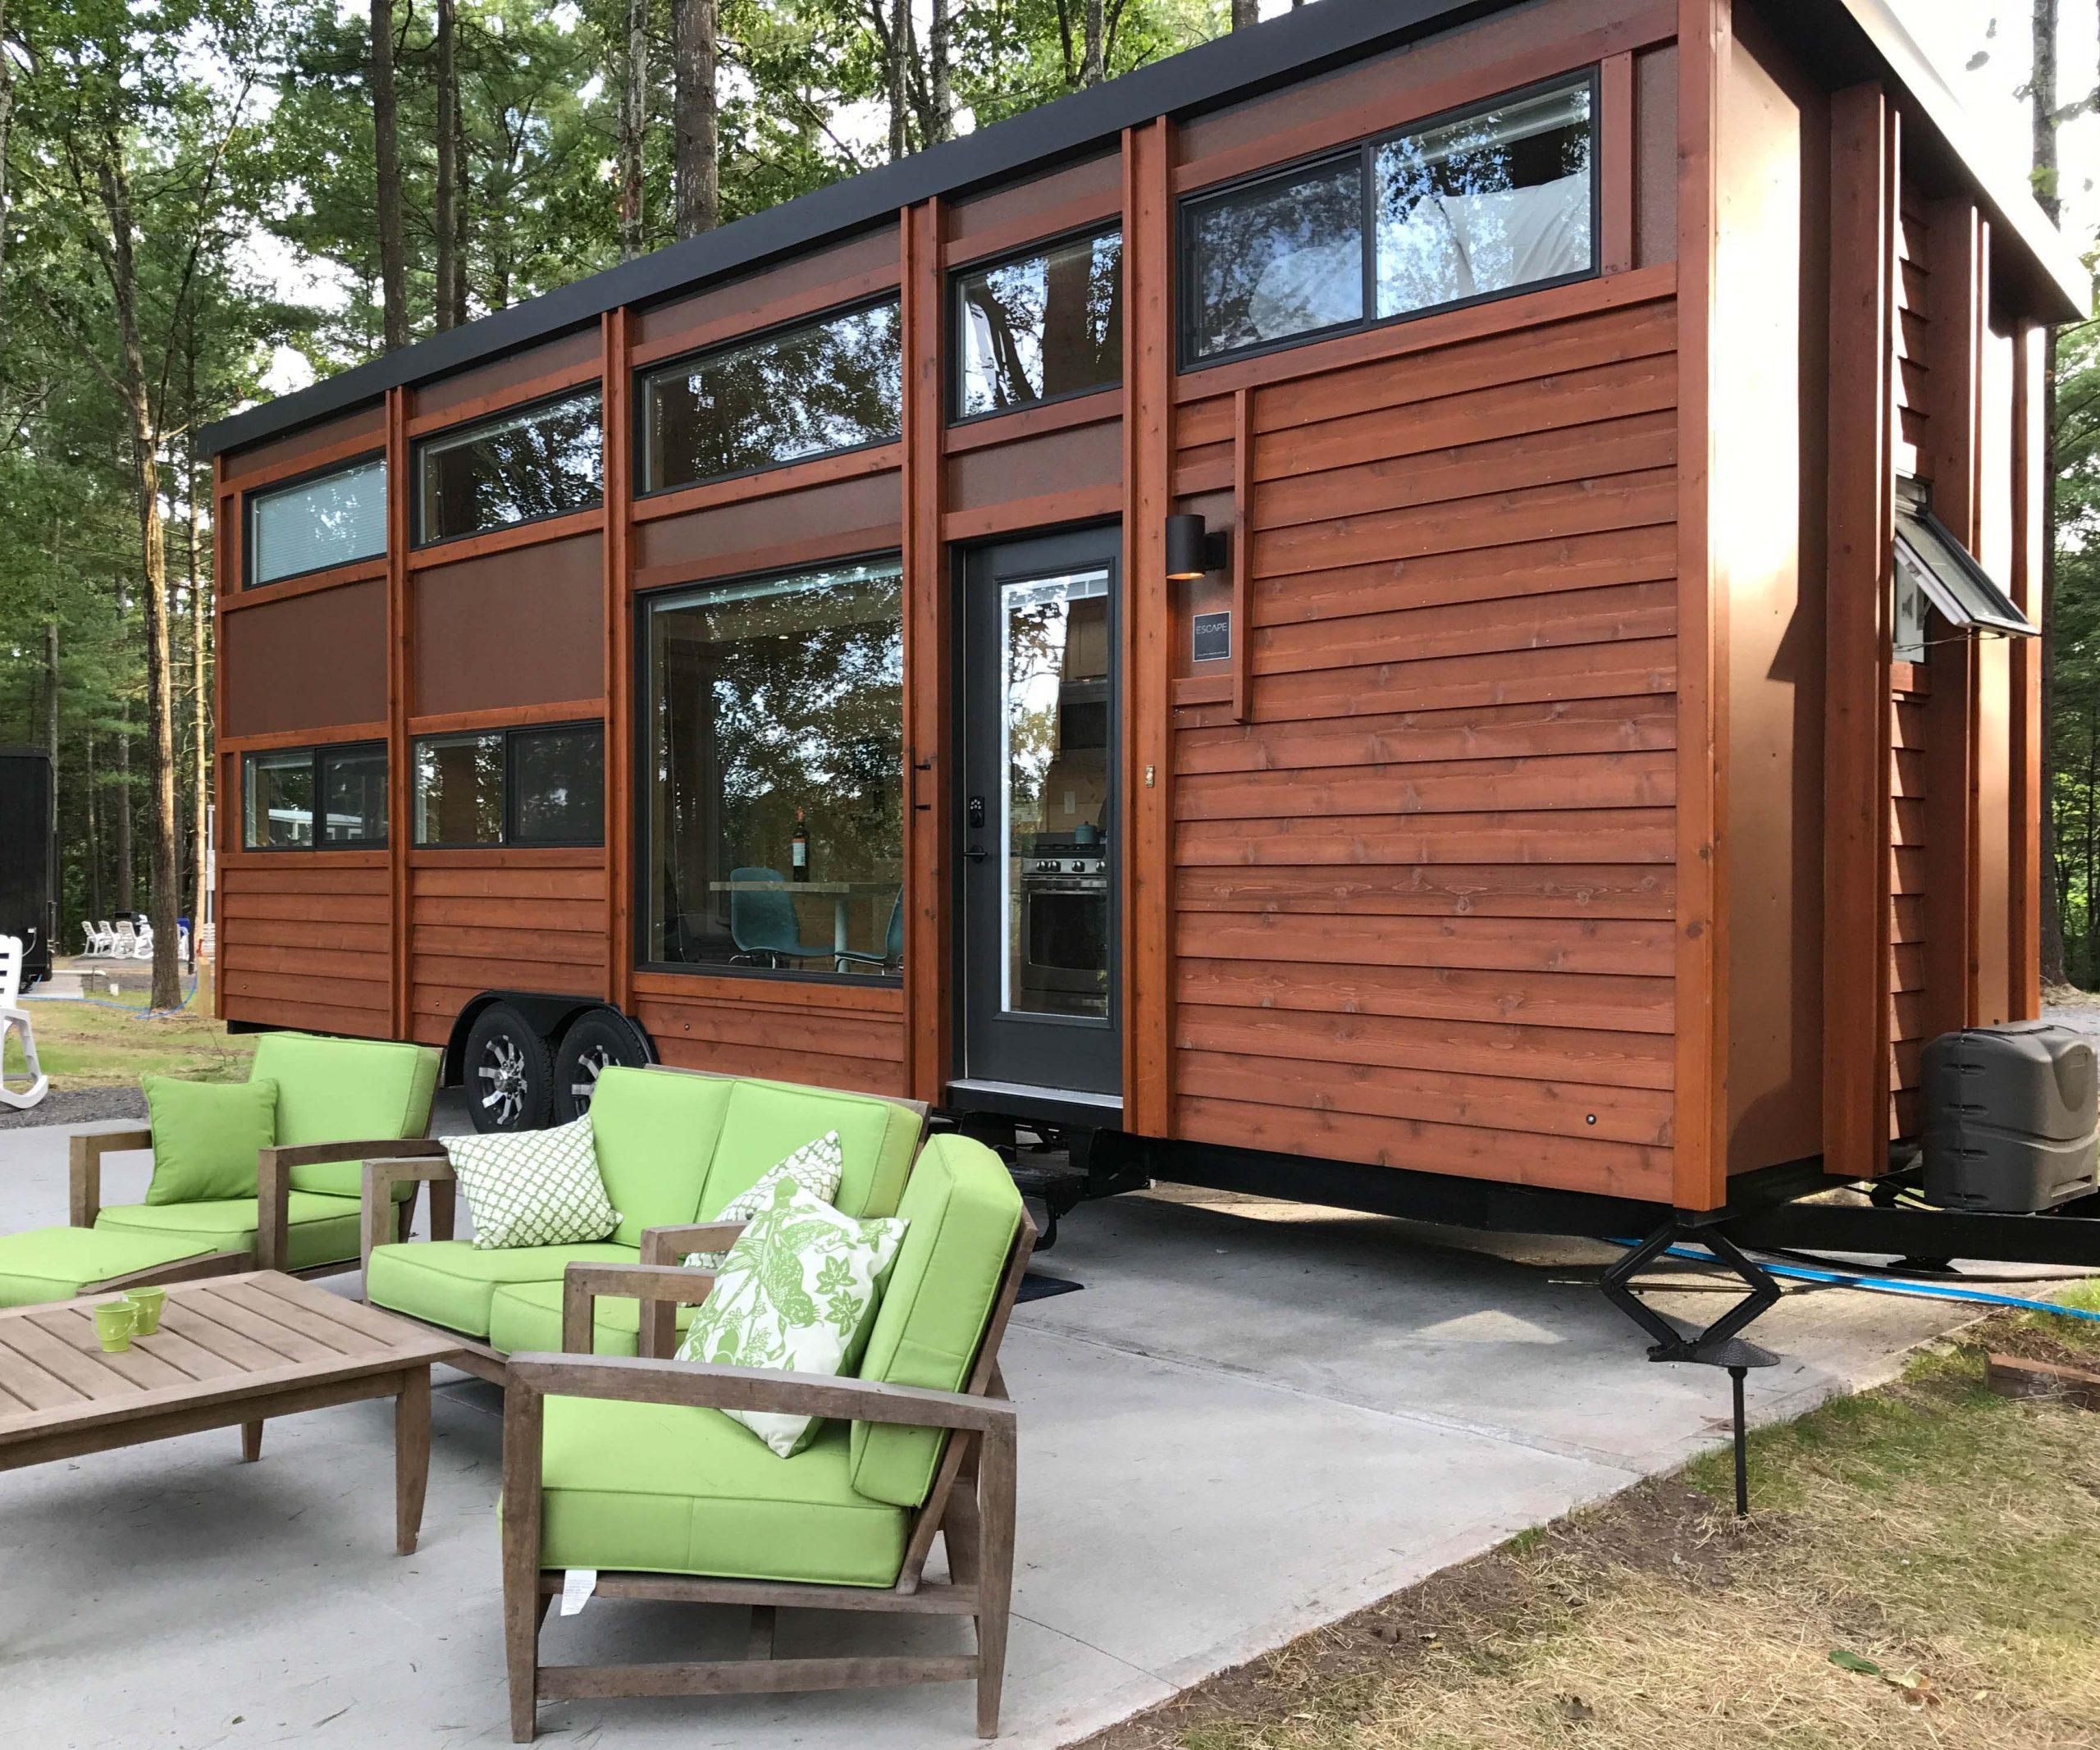 Greene A Tiny House Resort